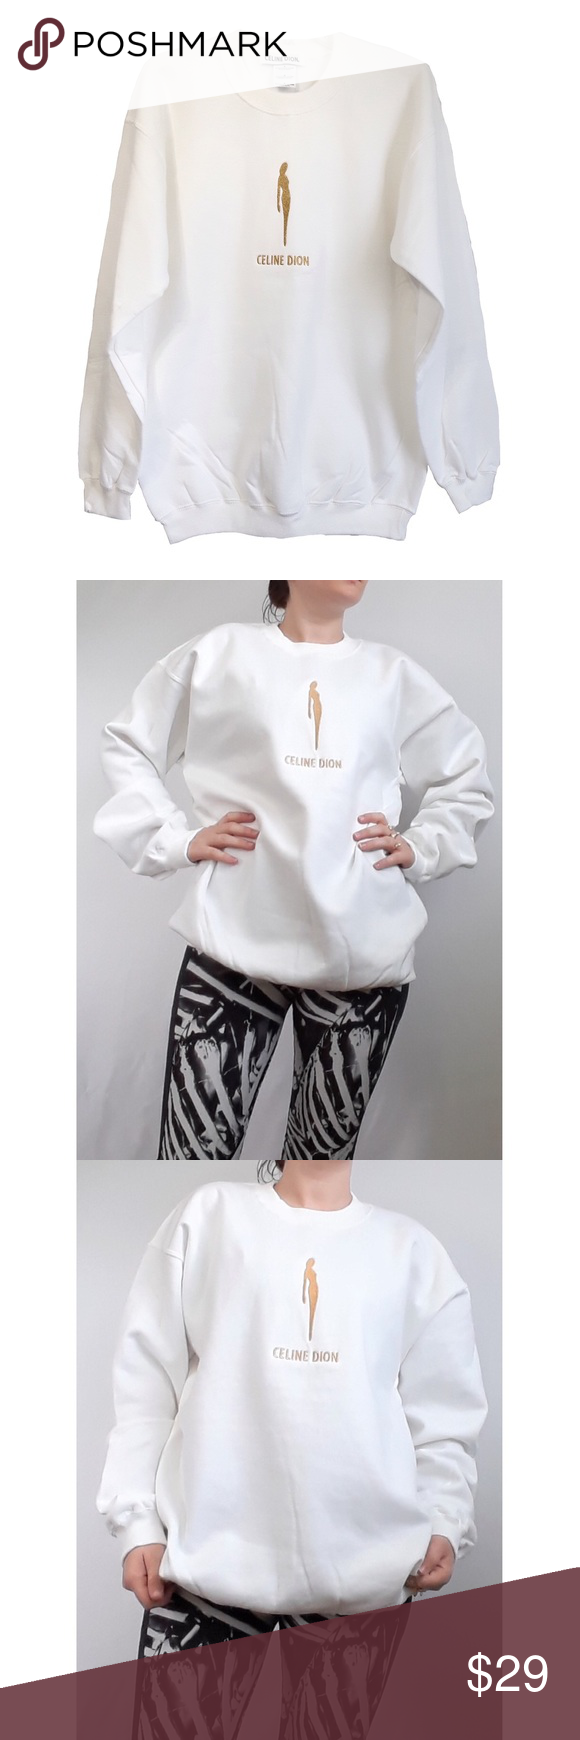 Celine Dion White Oversized Boyfriend Sweatshirt M Boyfriend Sweatshirts Sweatshirts White Long Sleeve [ 1740 x 580 Pixel ]